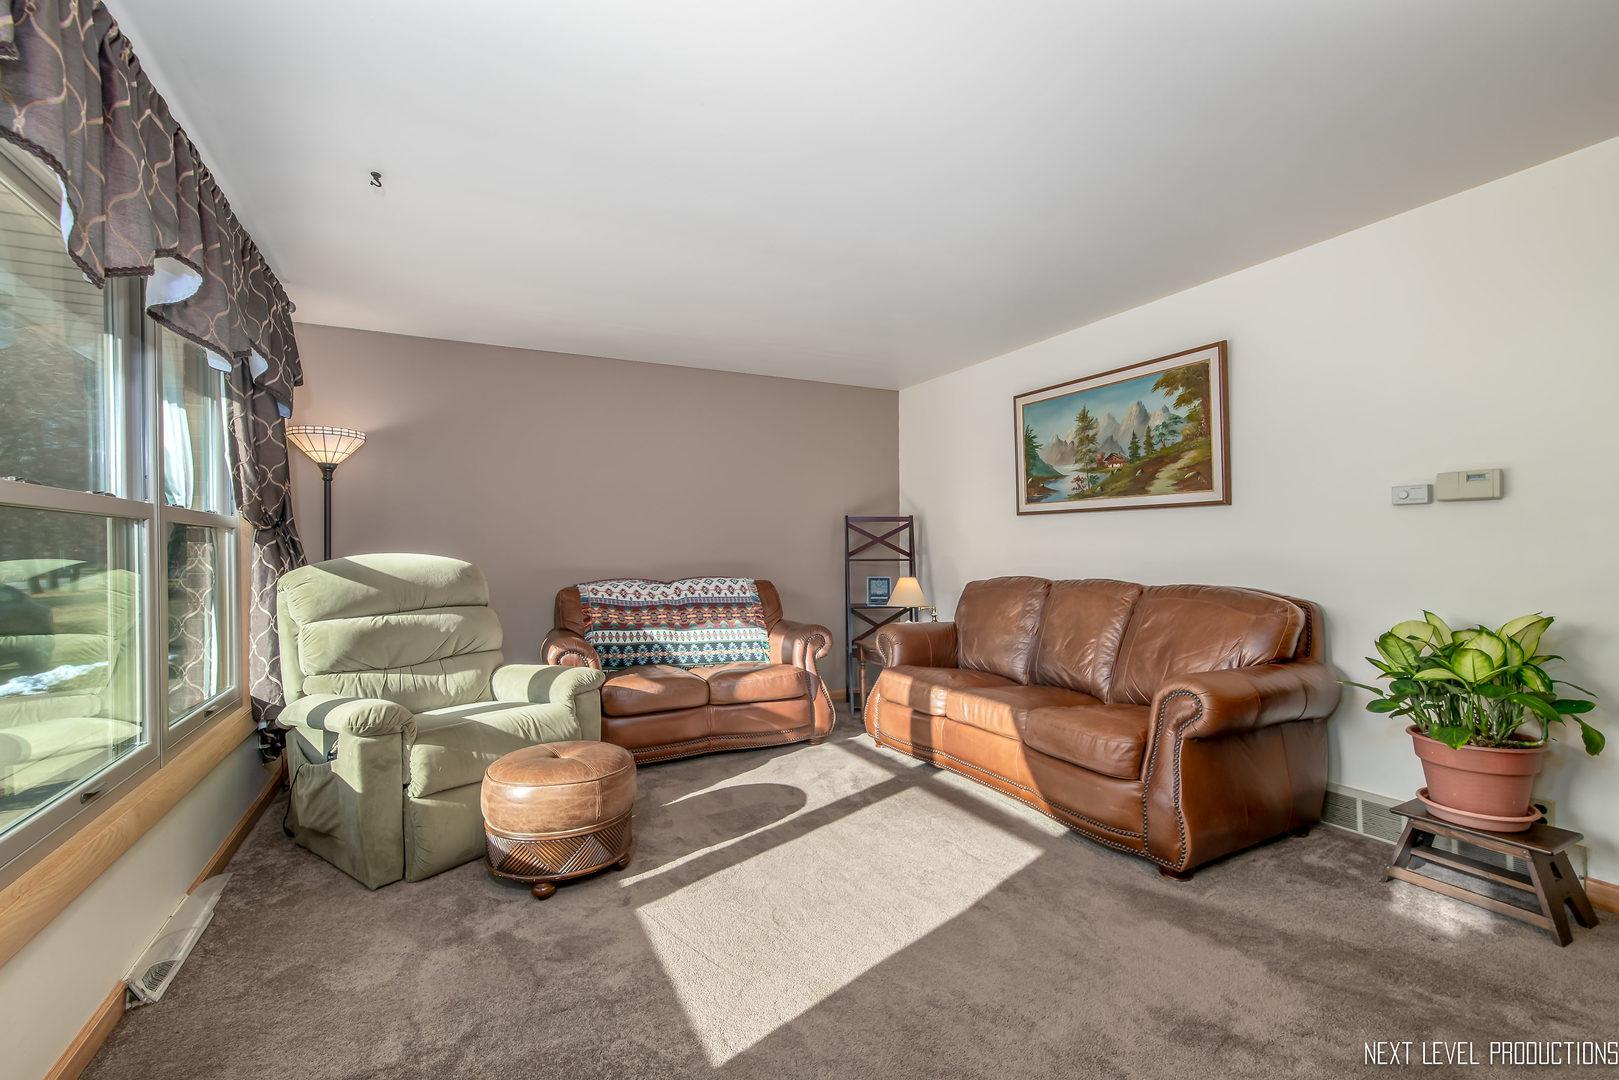 27 North Cypress, Bristol, Illinois, 60512